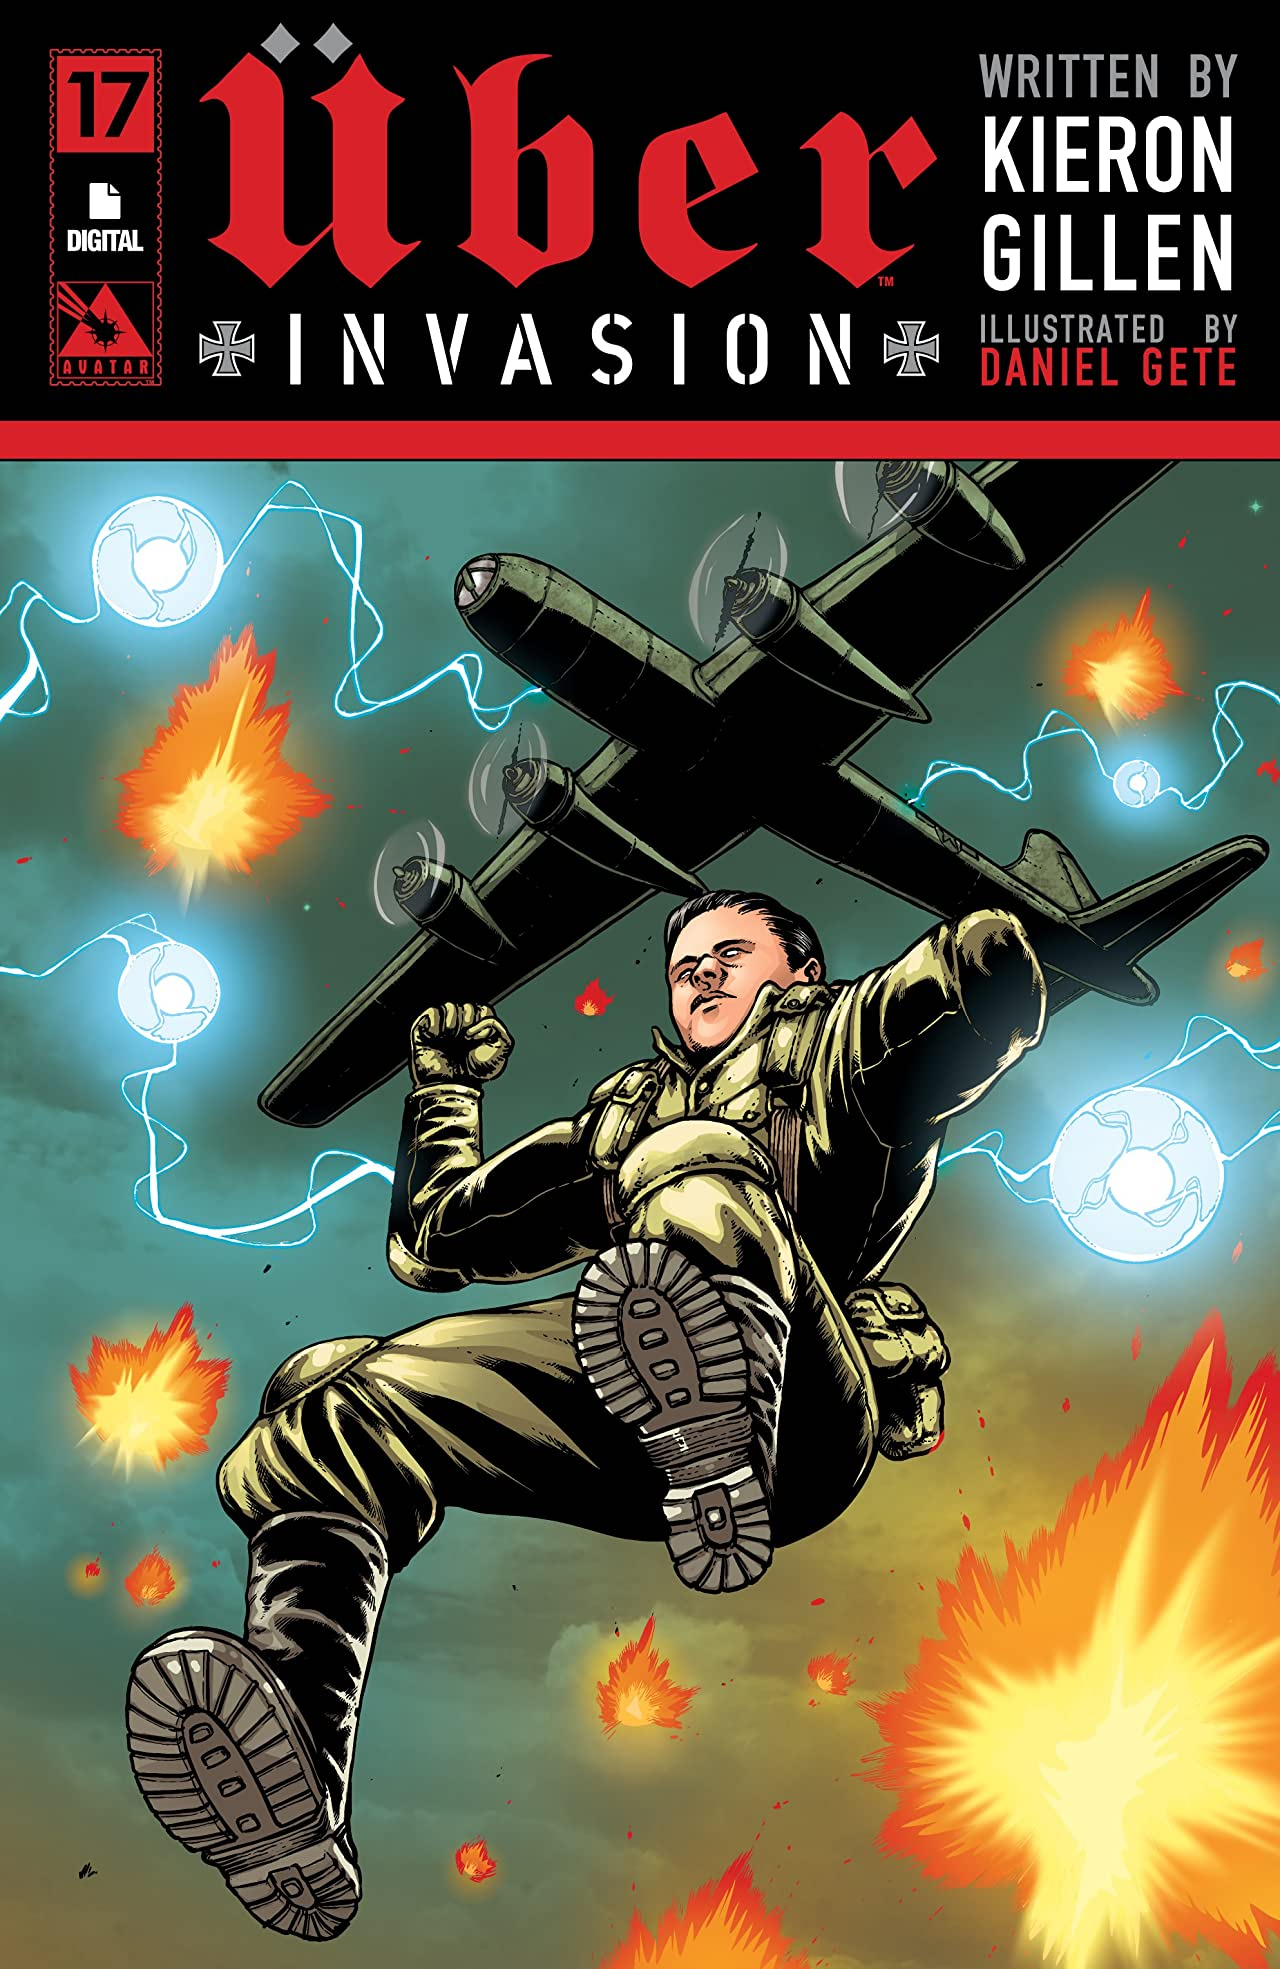 Uber: Invasion #17